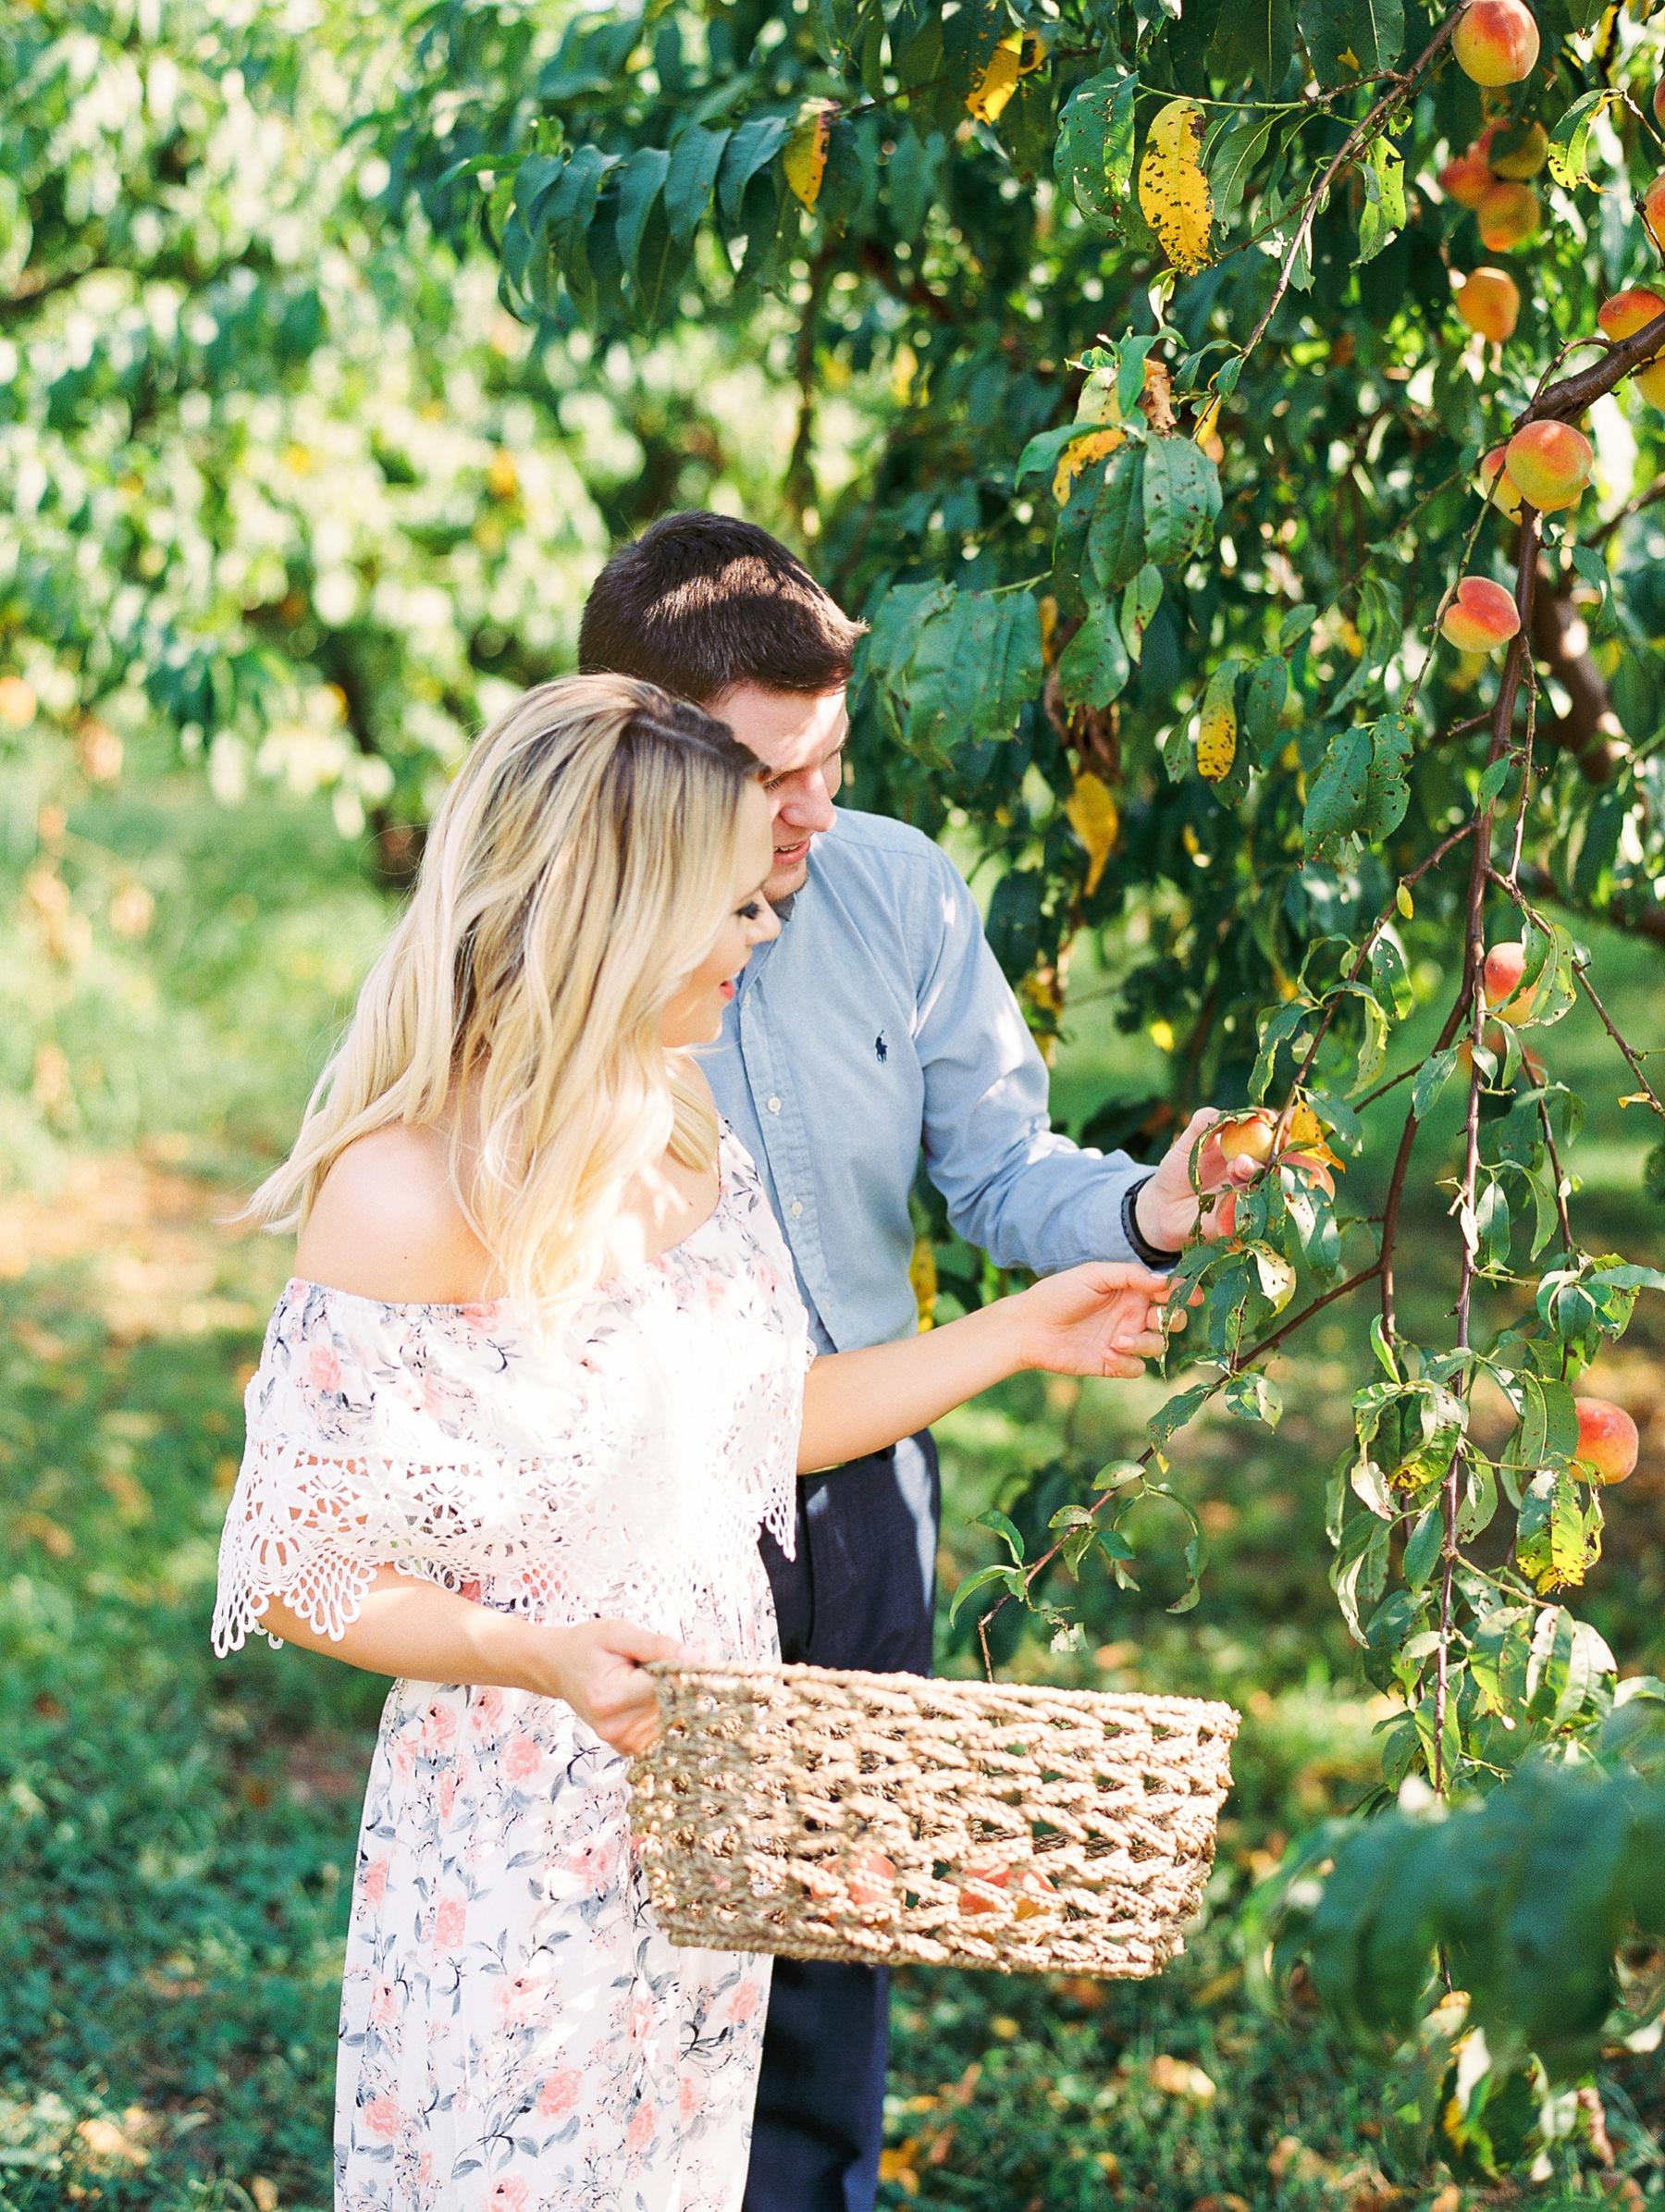 Peach-Orchard-Engagement-Session-Arkansas_0001.jpg